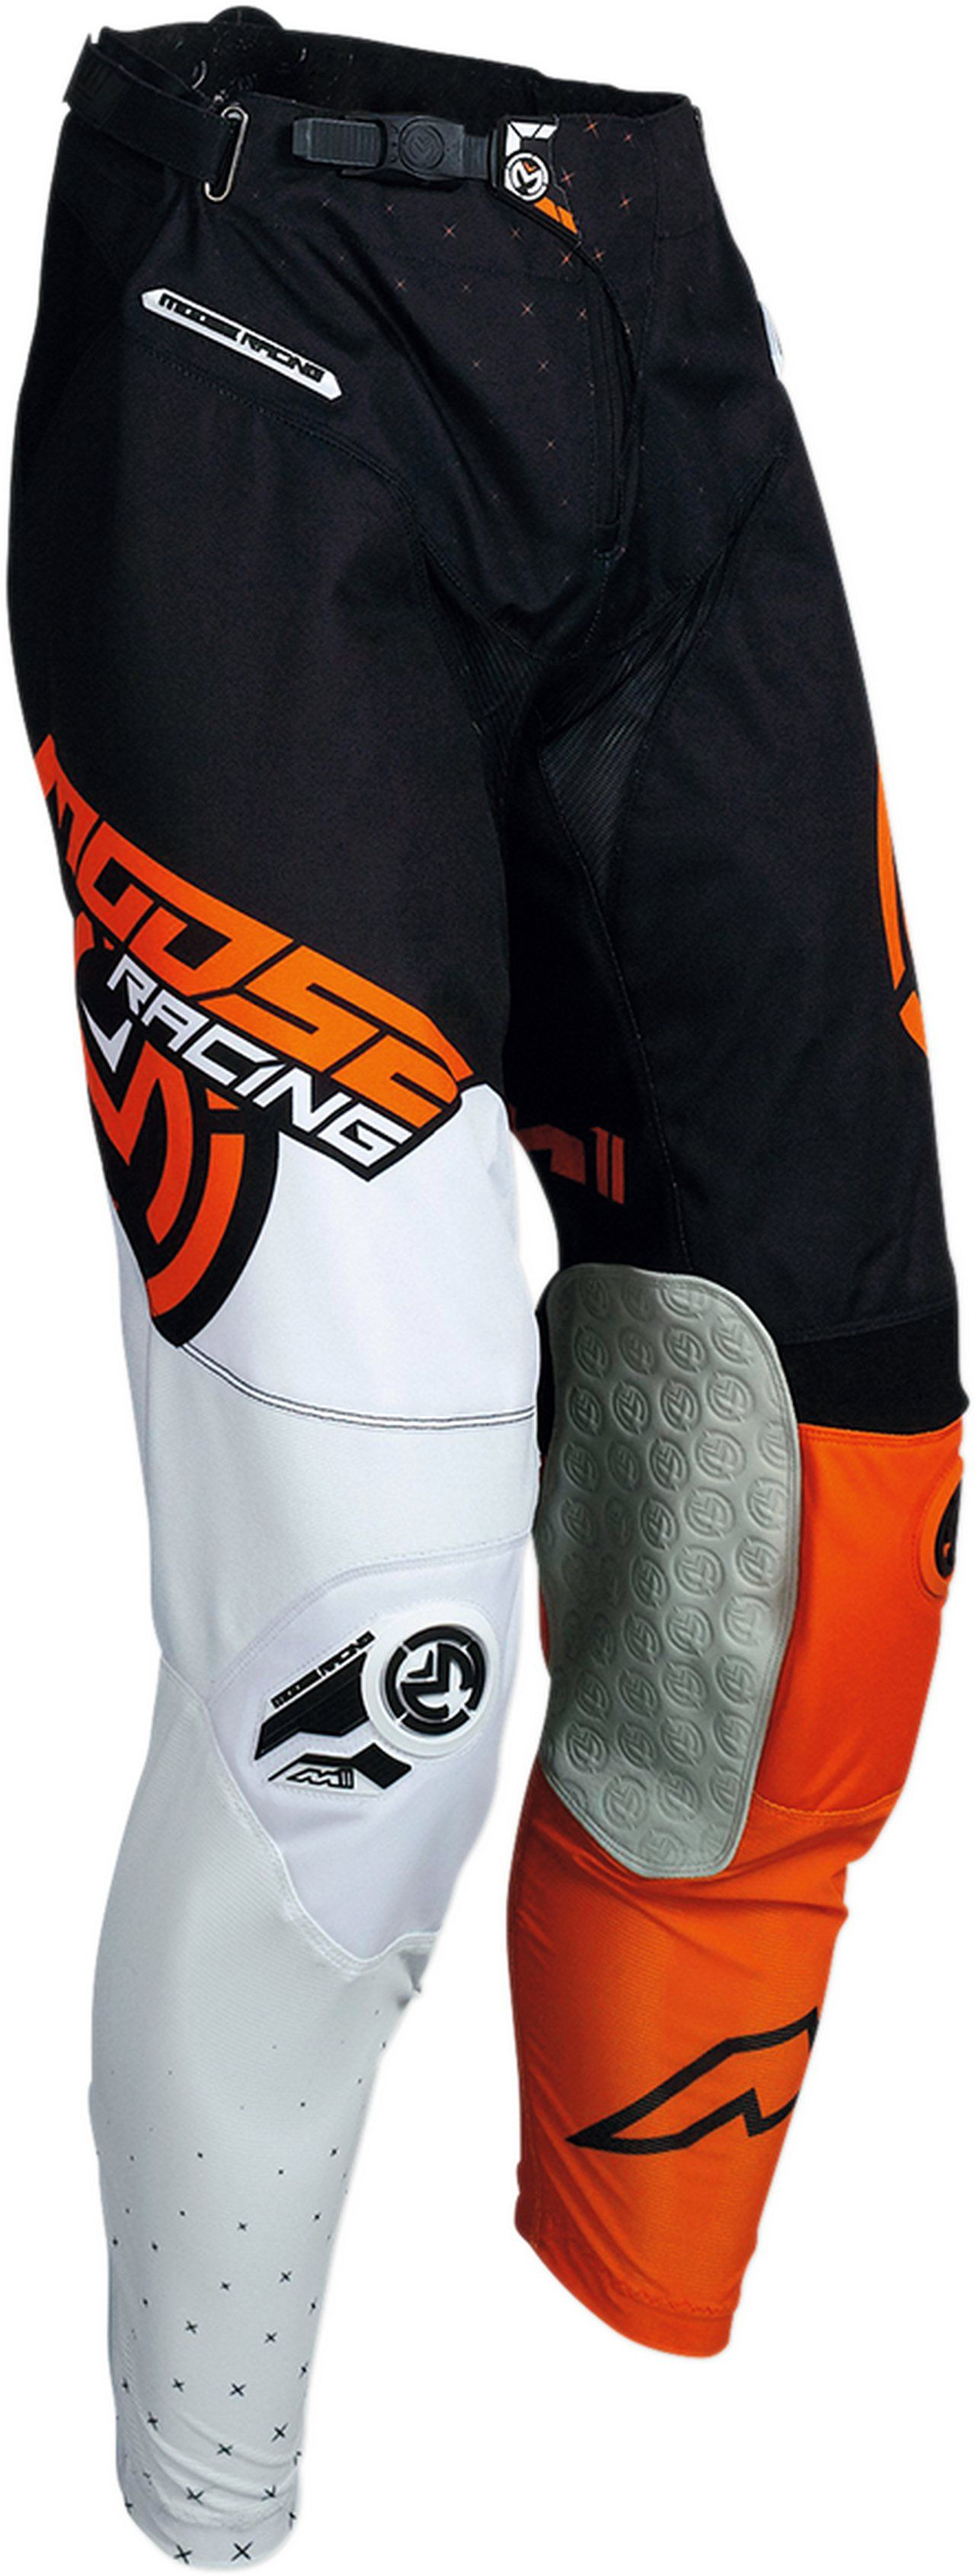 【MOOSE RACING】M1 越野車褲 [2901-6656] - 「Webike-摩托百貨」